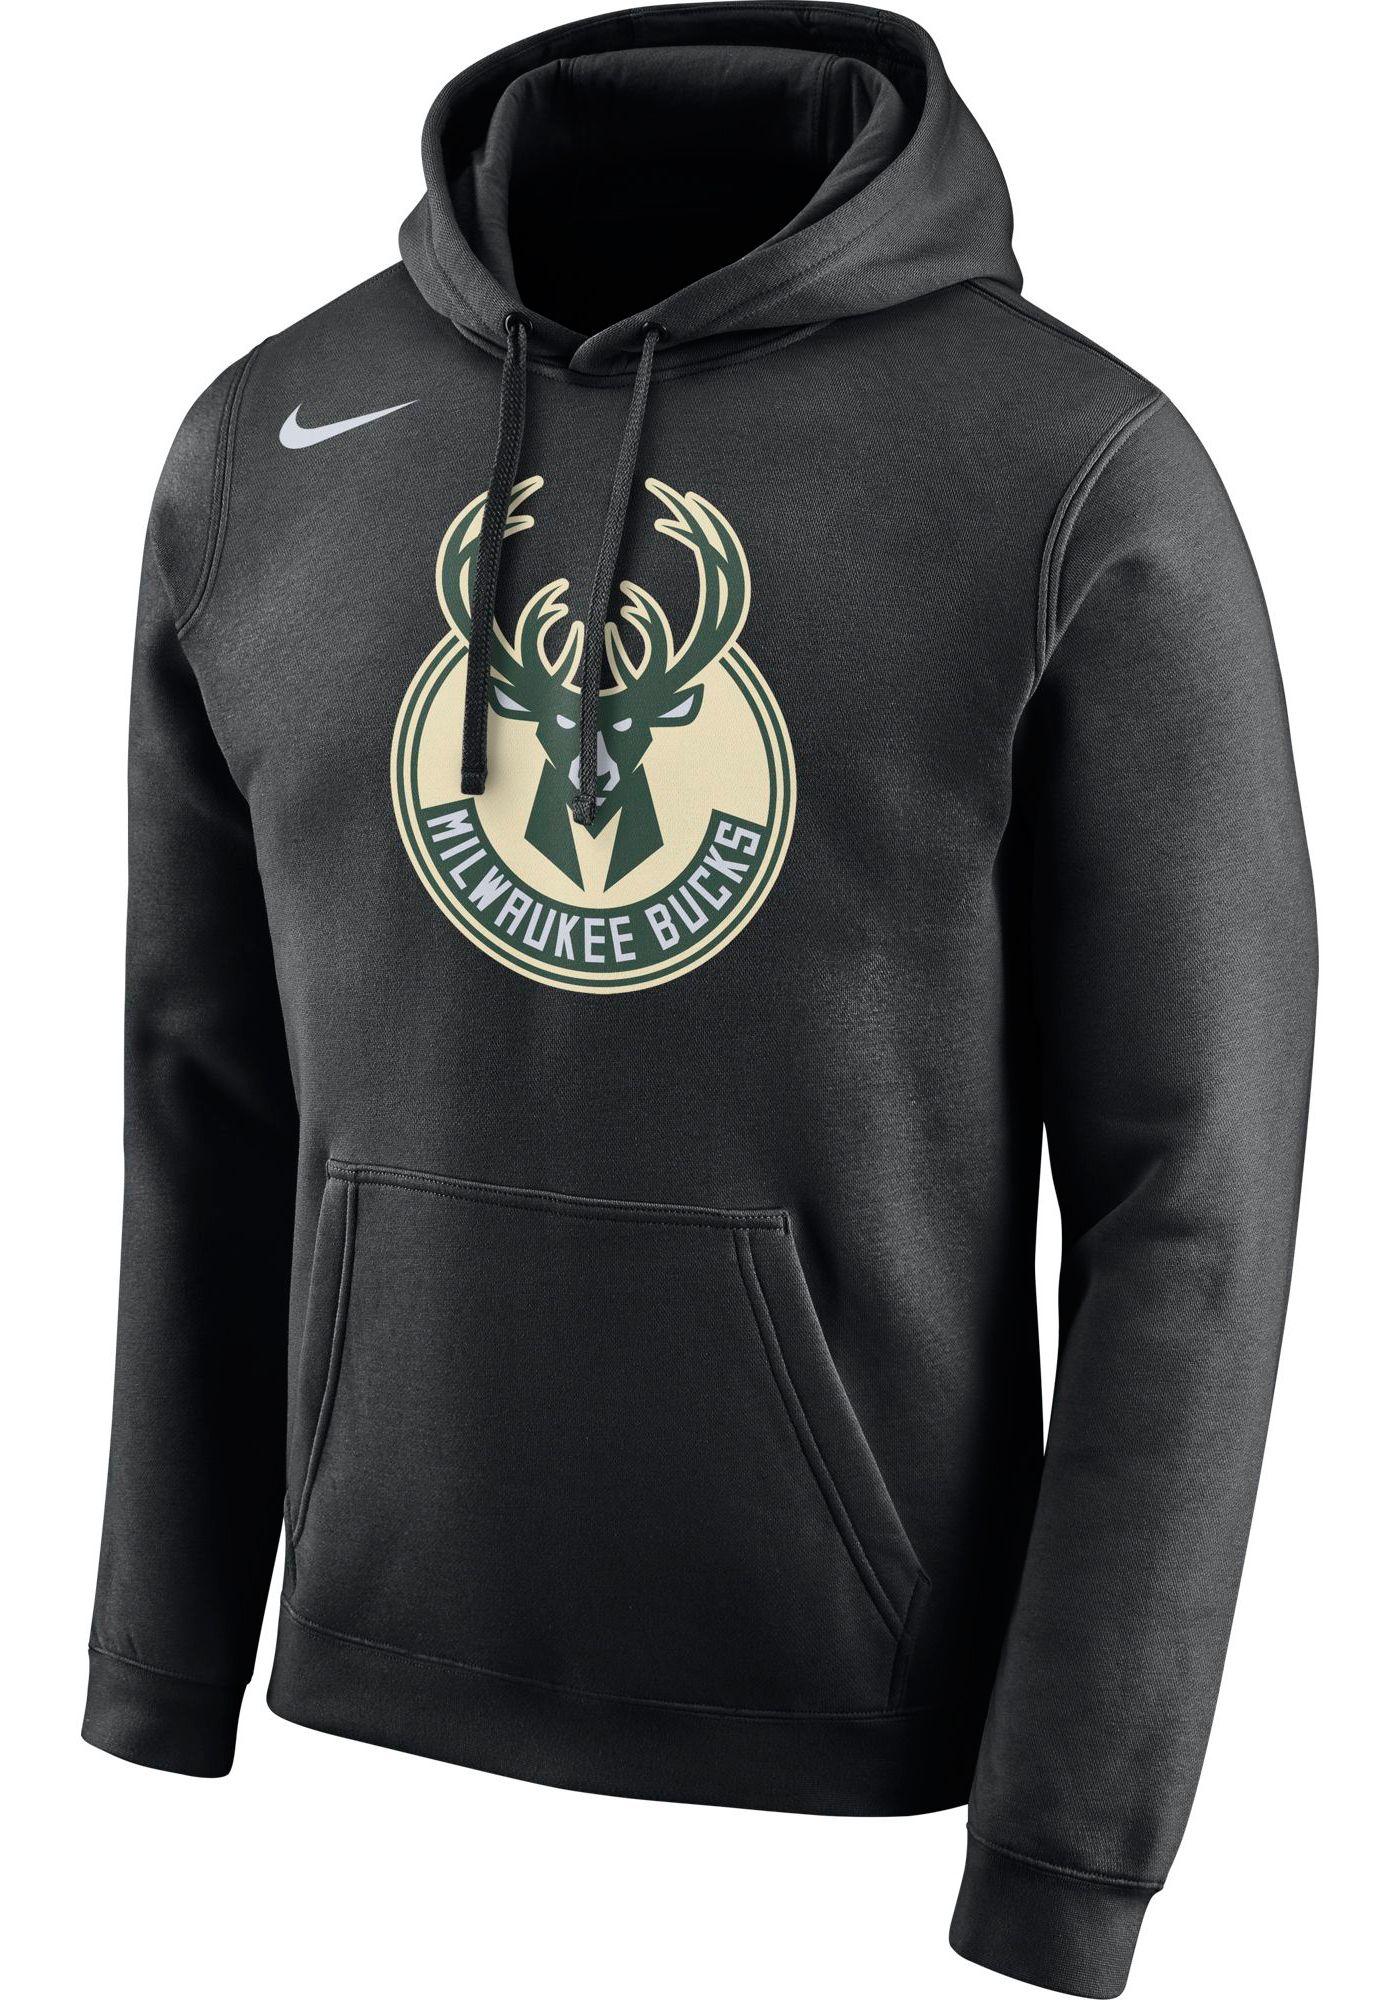 Nike Men's Milwaukee Bucks Pullover Hoodie